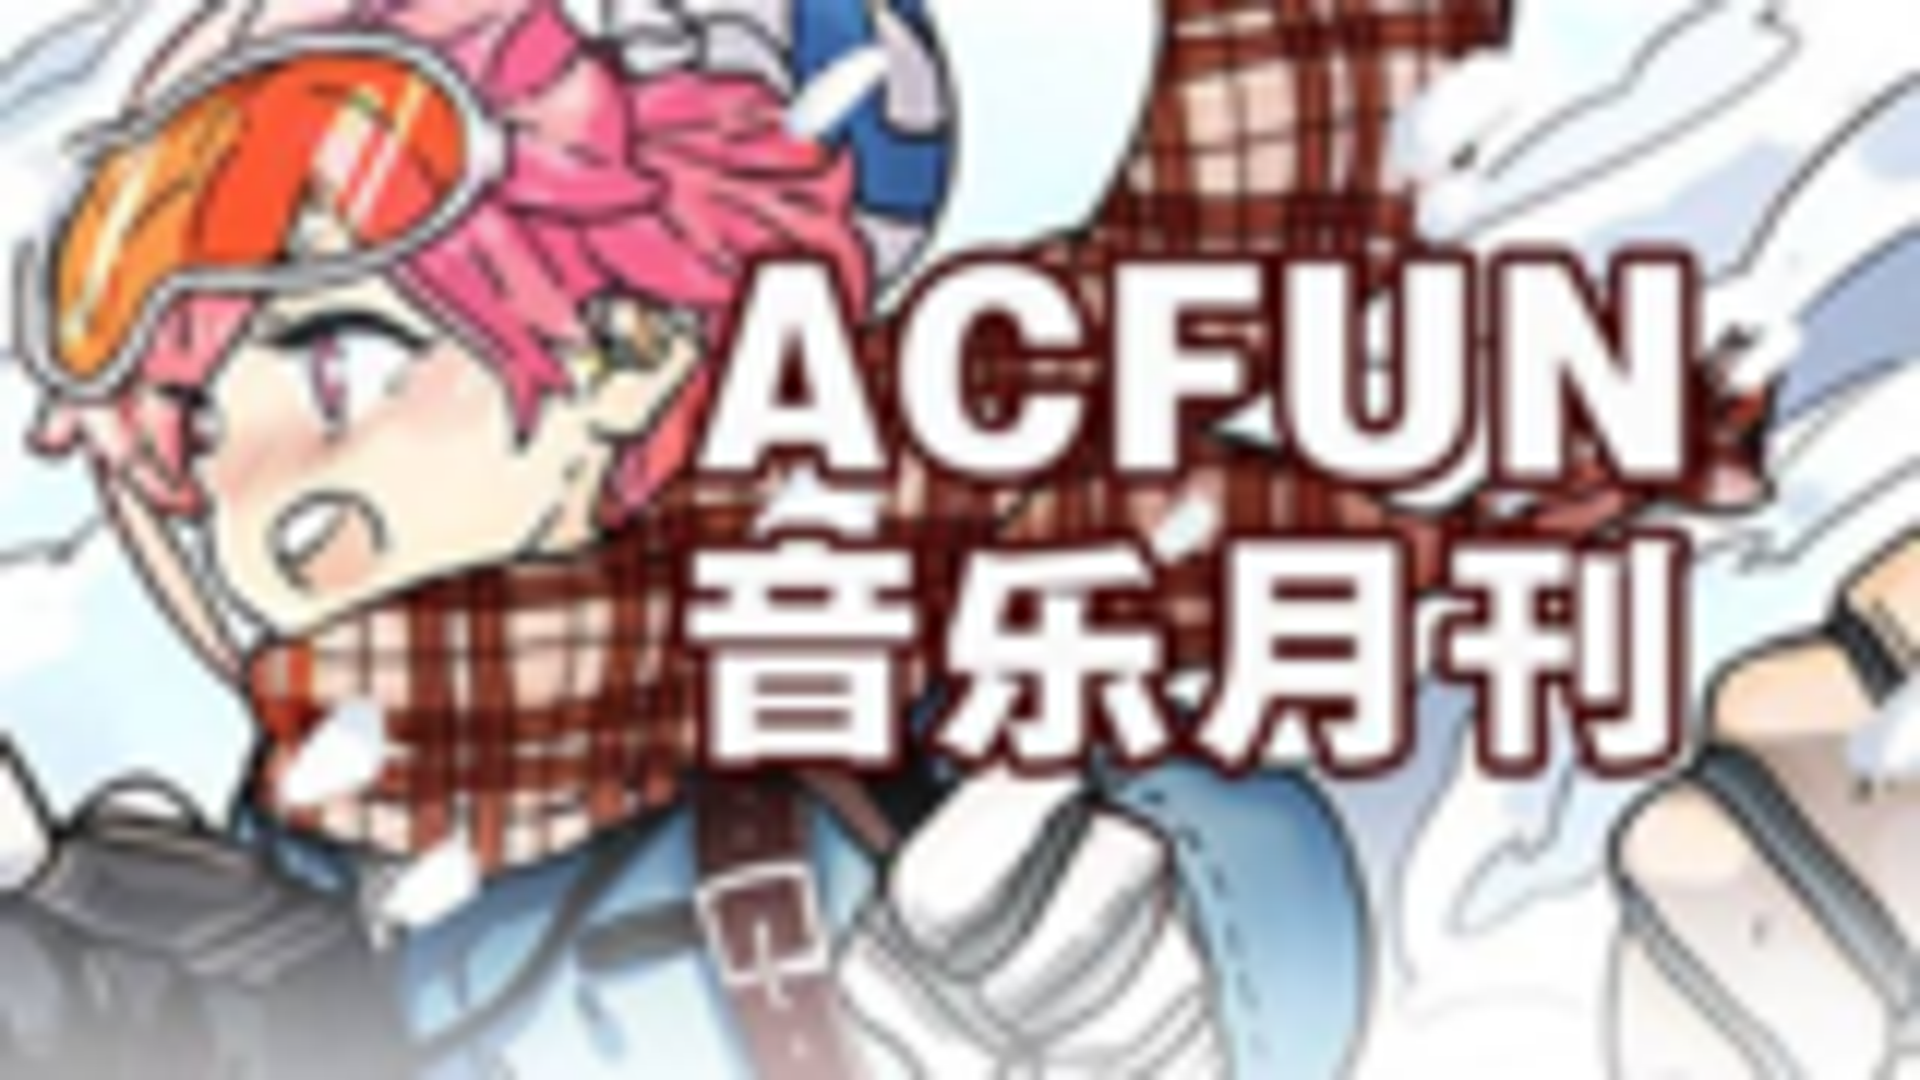 【AcFun音乐月刊12月刊】虽姗姗来迟,但好听不减